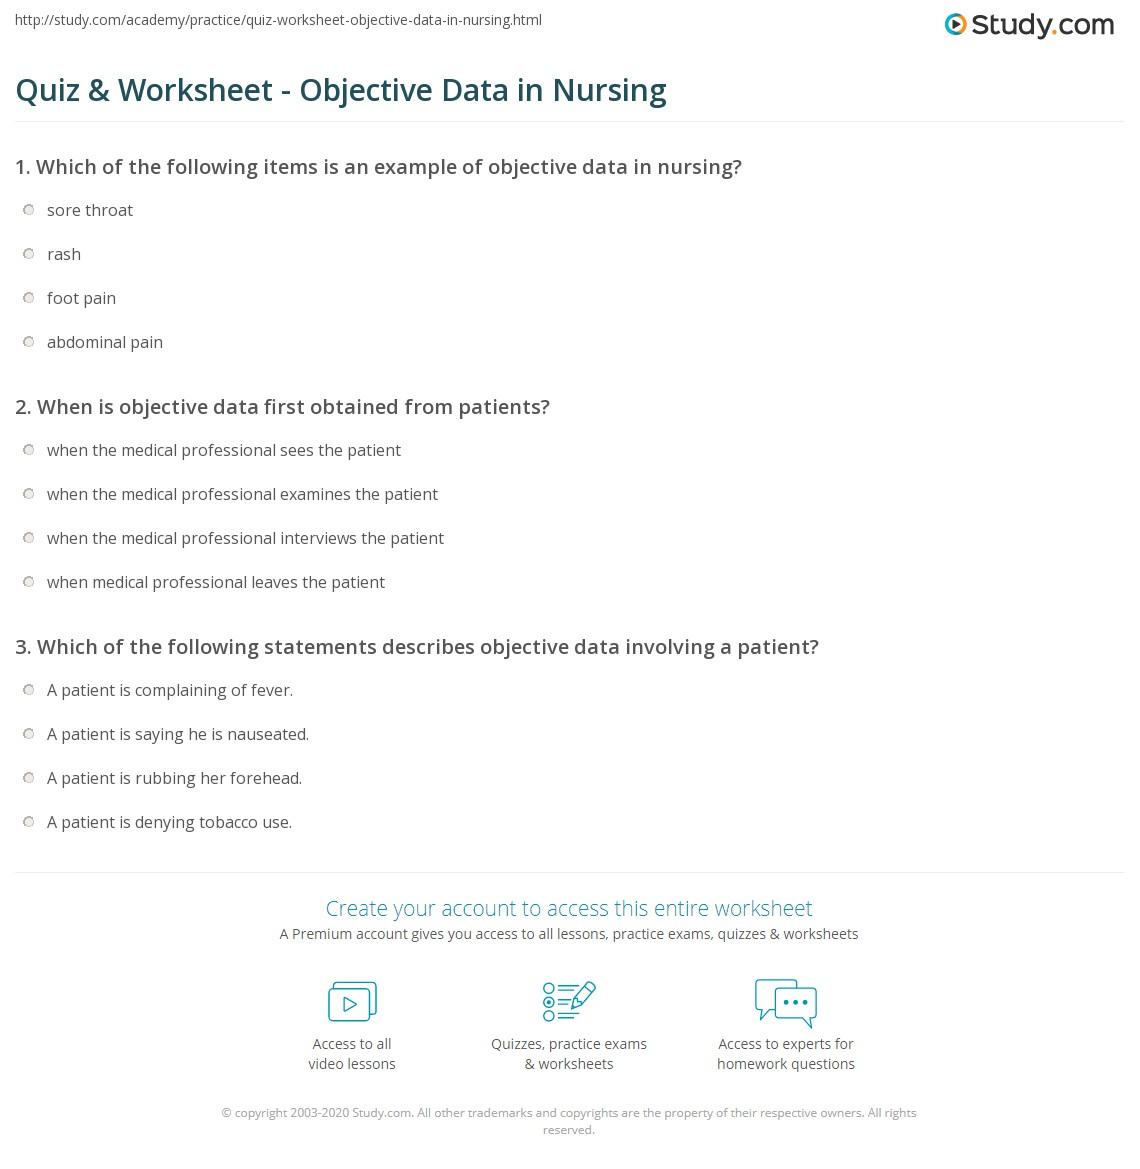 quiz worksheet objective data in nursing com print objective data in nursing definition examples worksheet